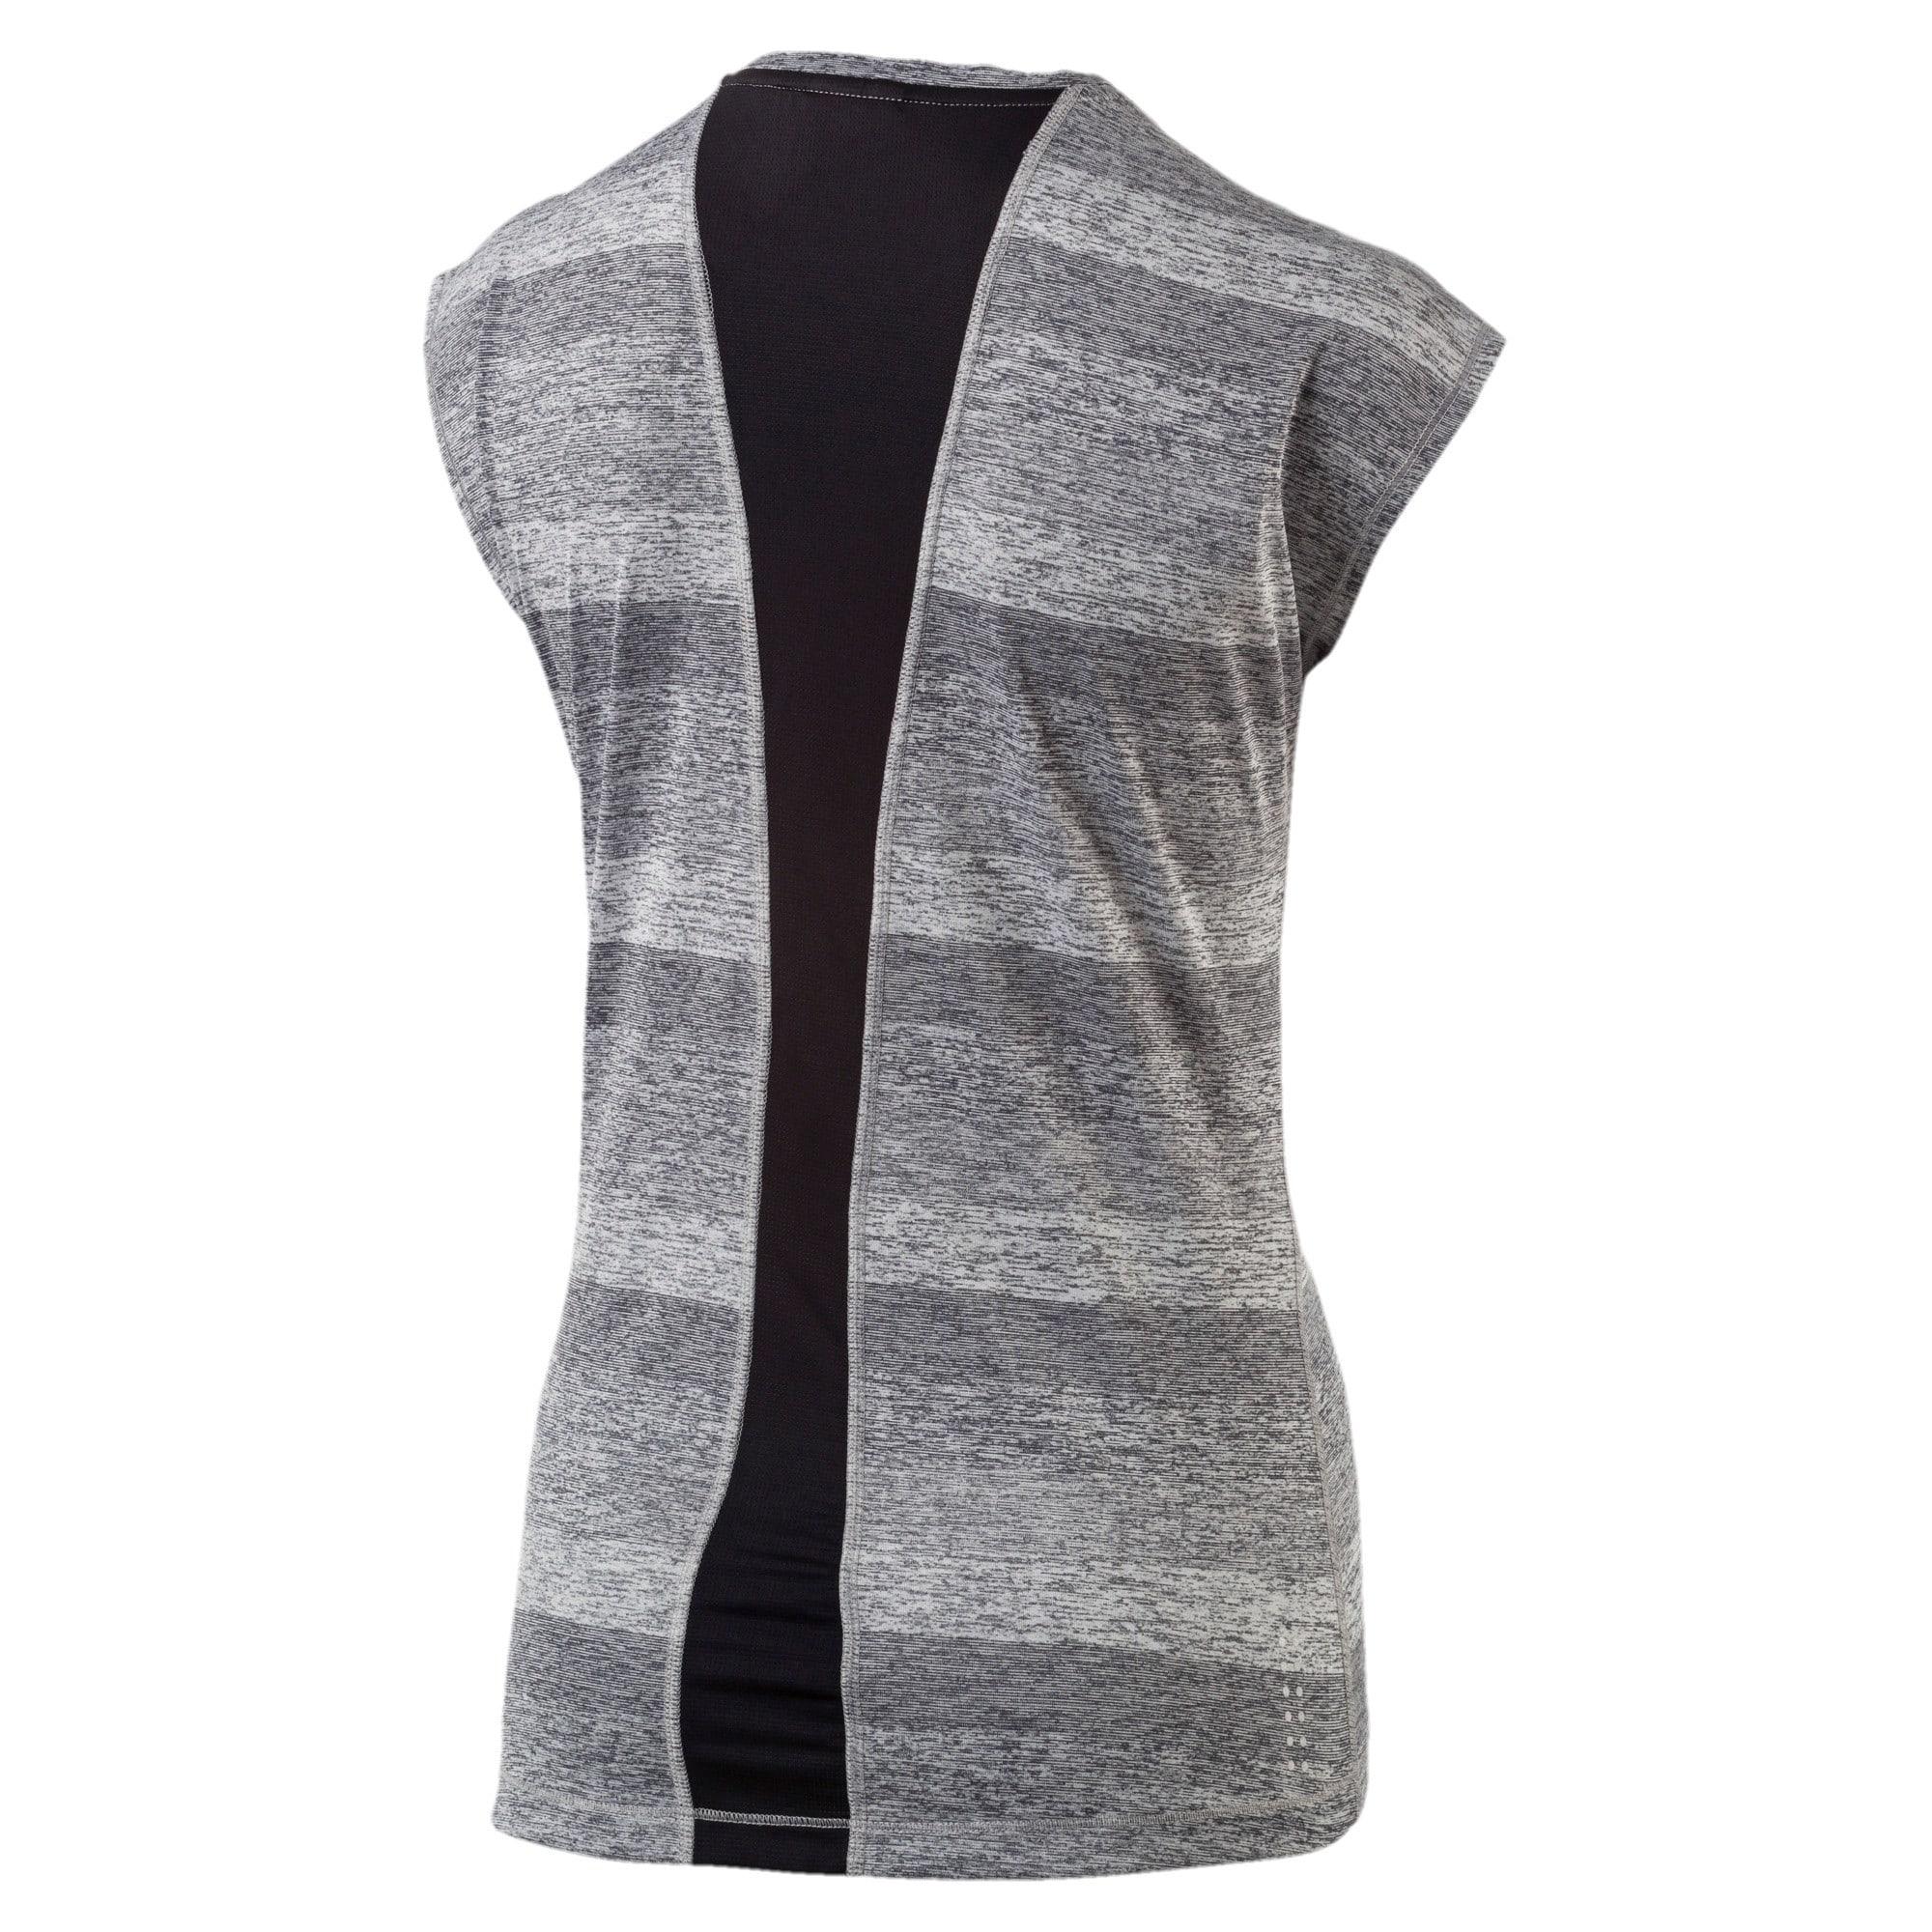 Thumbnail 2 of Running Women's Epic T-Shirt, Medium Gray Hthr-Puma Black, medium-IND